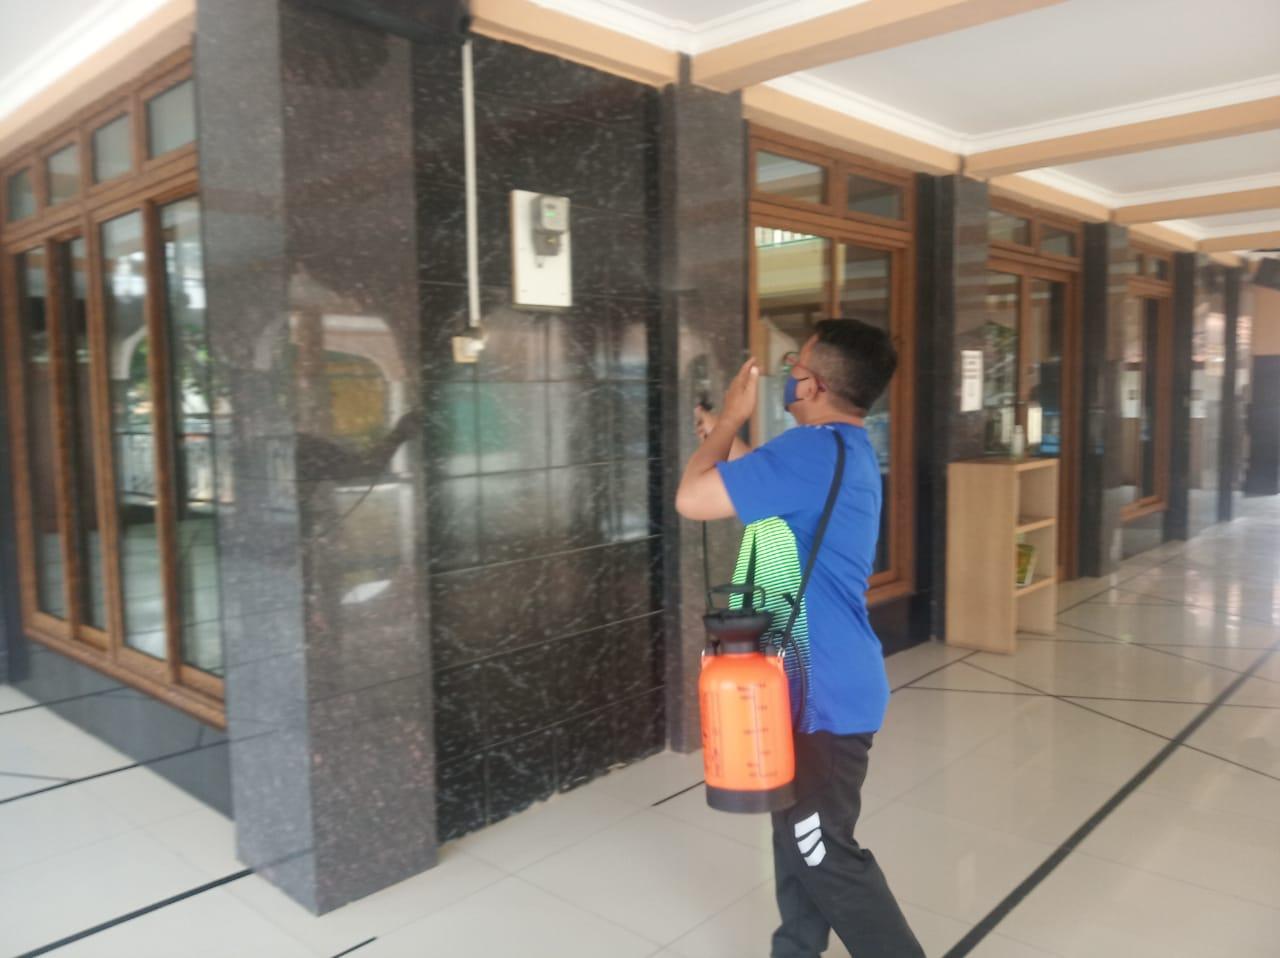 Cegah Covid-19 Pemuda Kampung Bulu Tambun Lakukan Penyemprotan Cairan Disinfektan BEKASIMEDIA.COM  